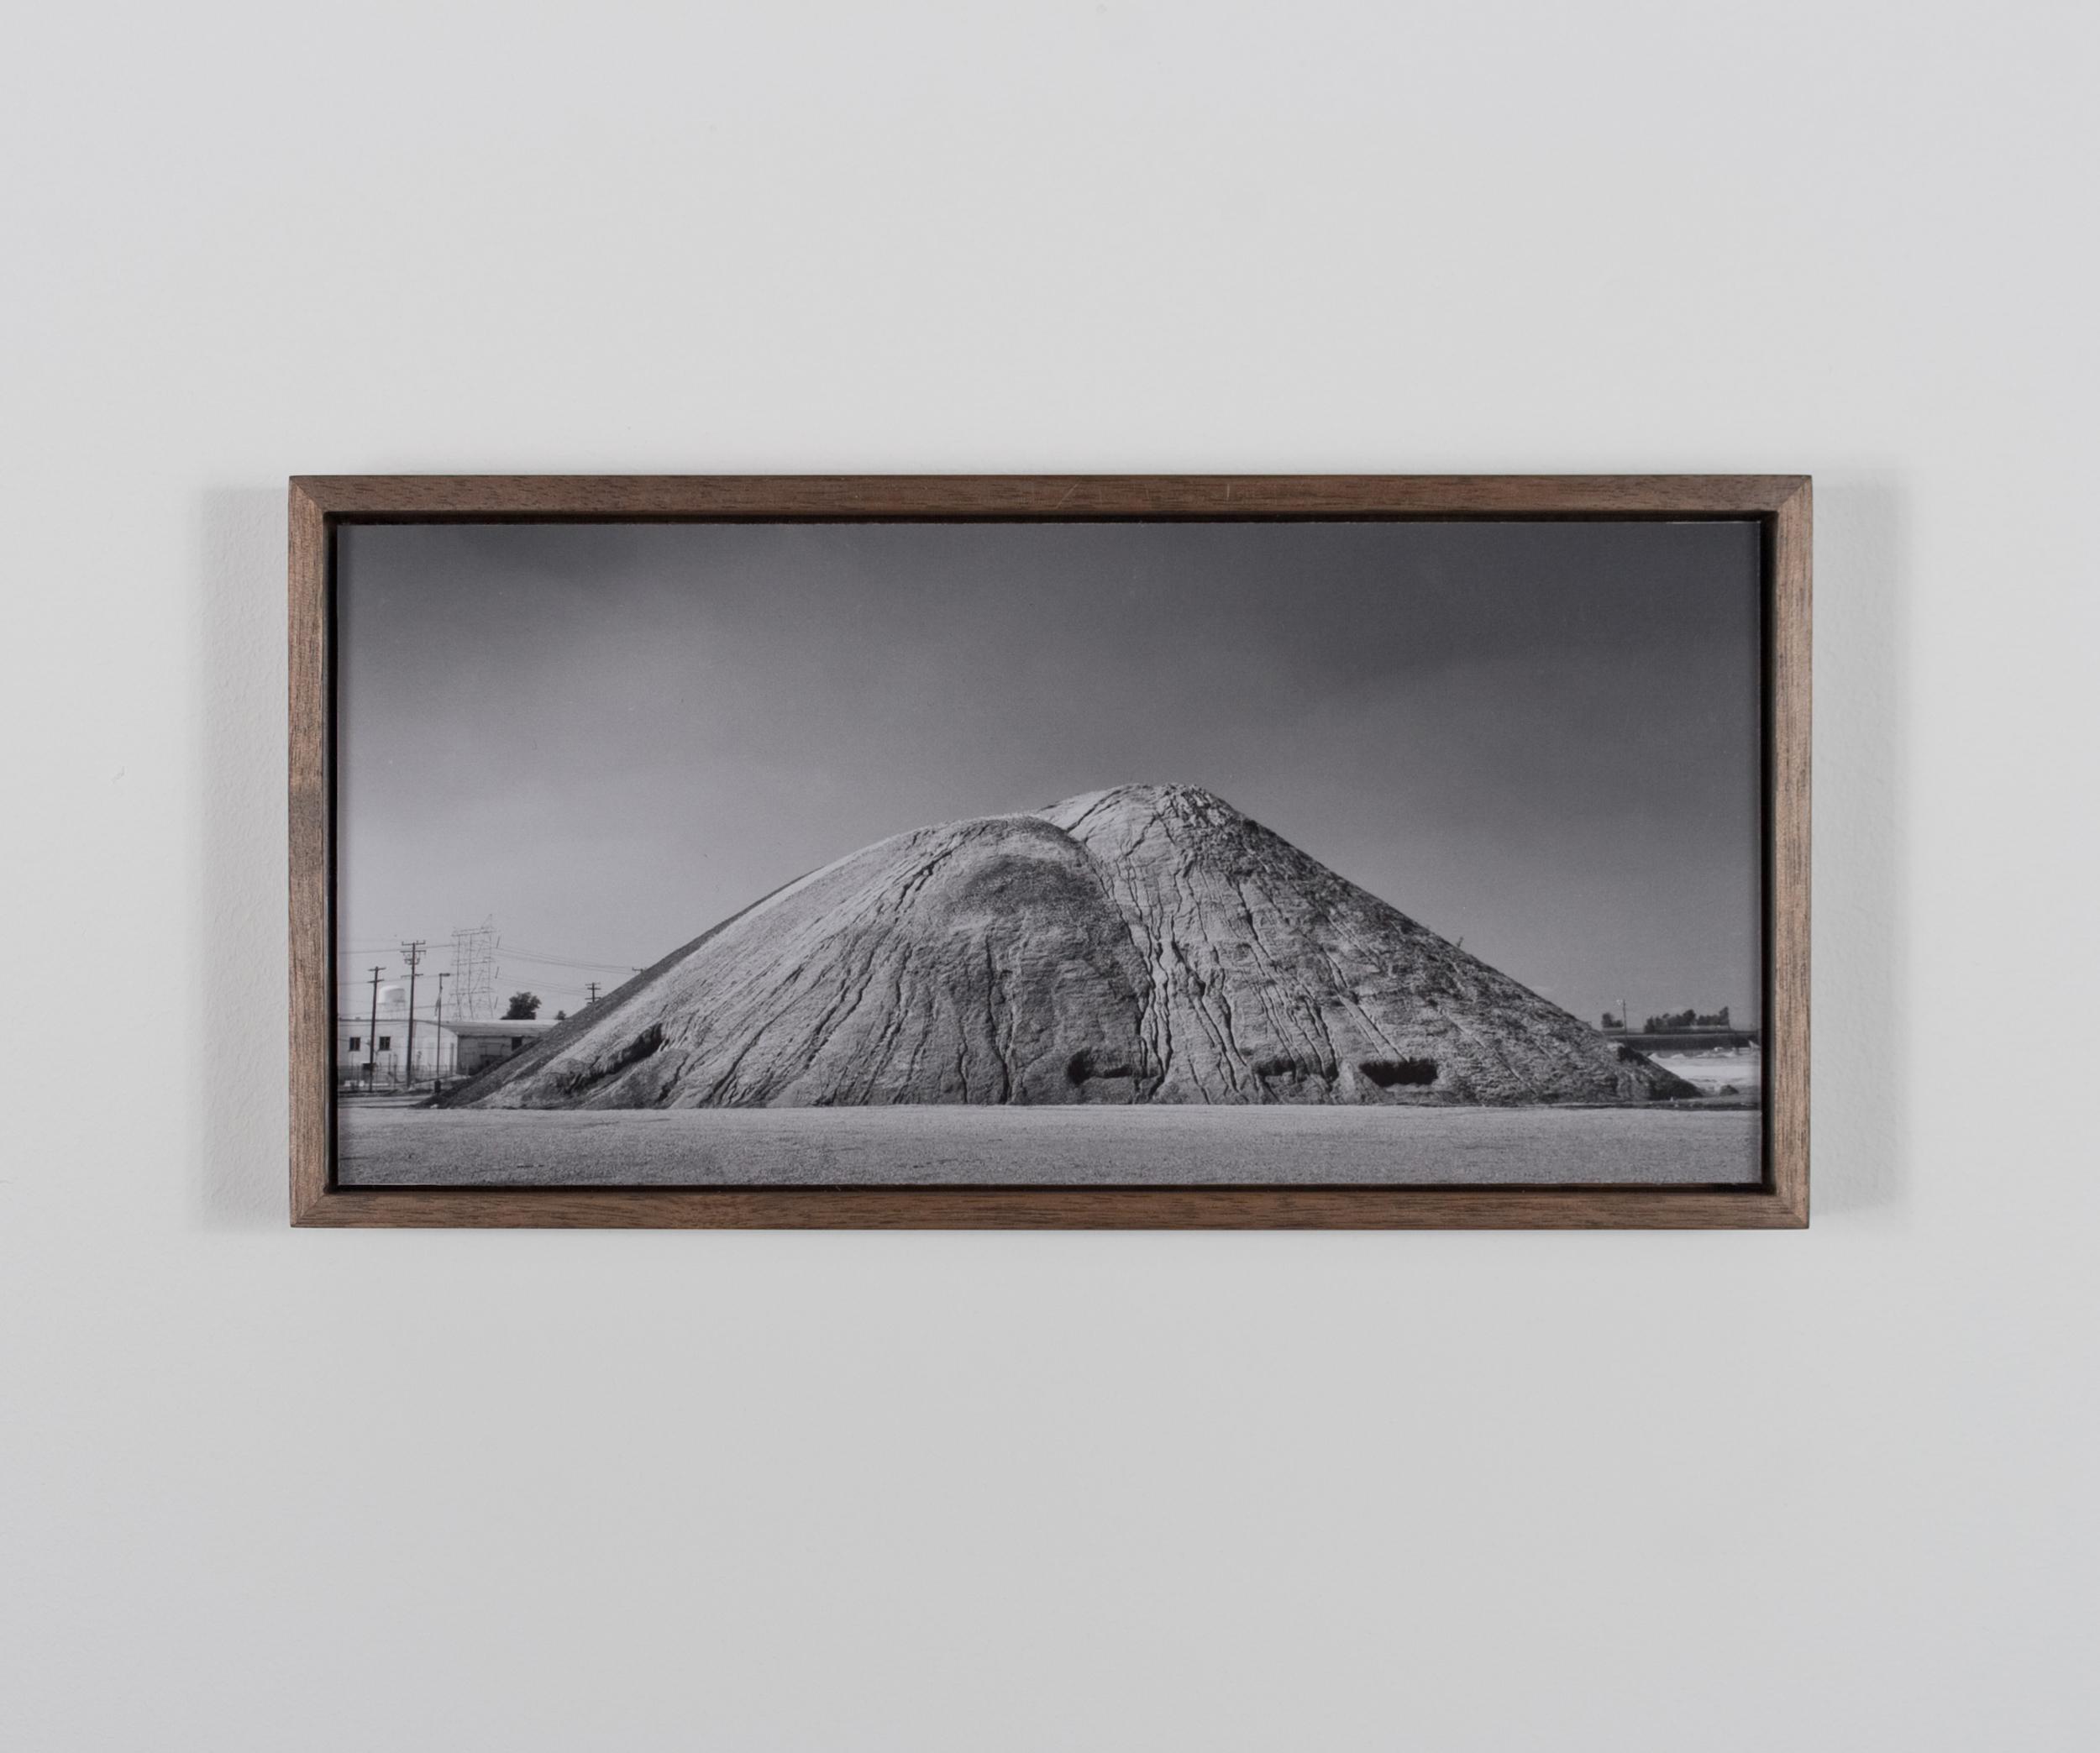 Suture Mountain 2009/10 Gelatin-silver print on Dibond, with walnut frame